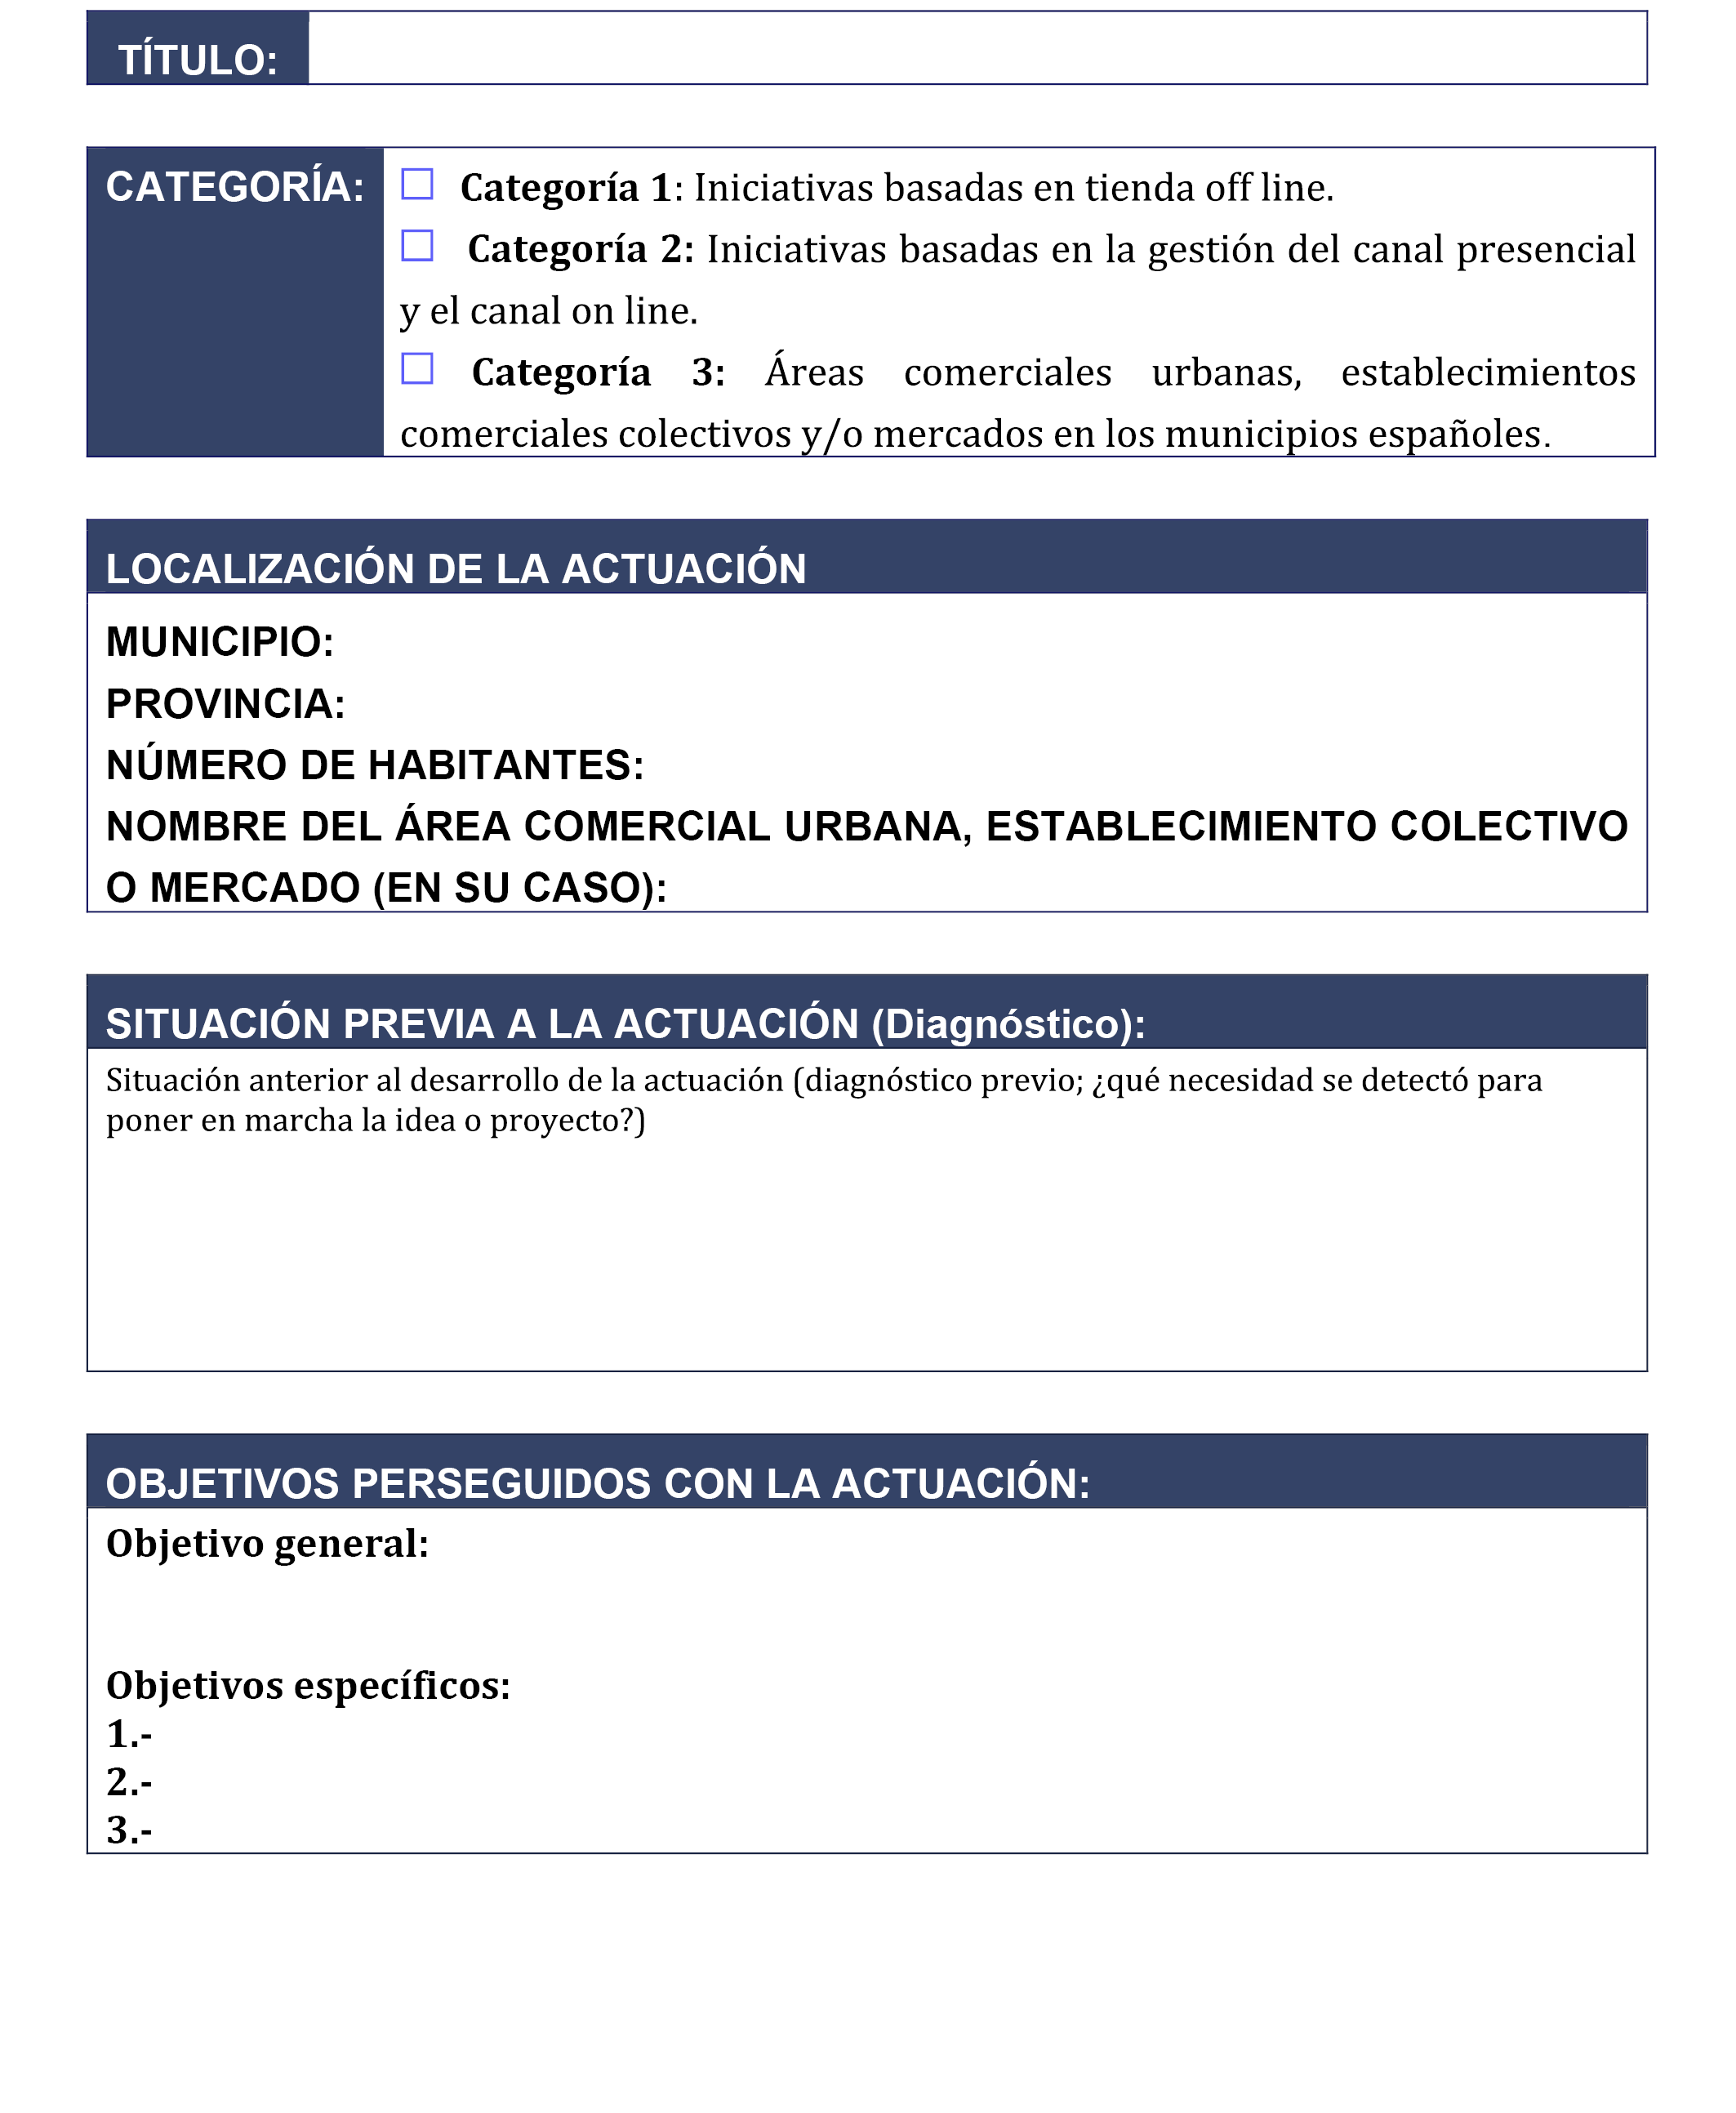 BOE.es - Documento BOE-A-2018-1664